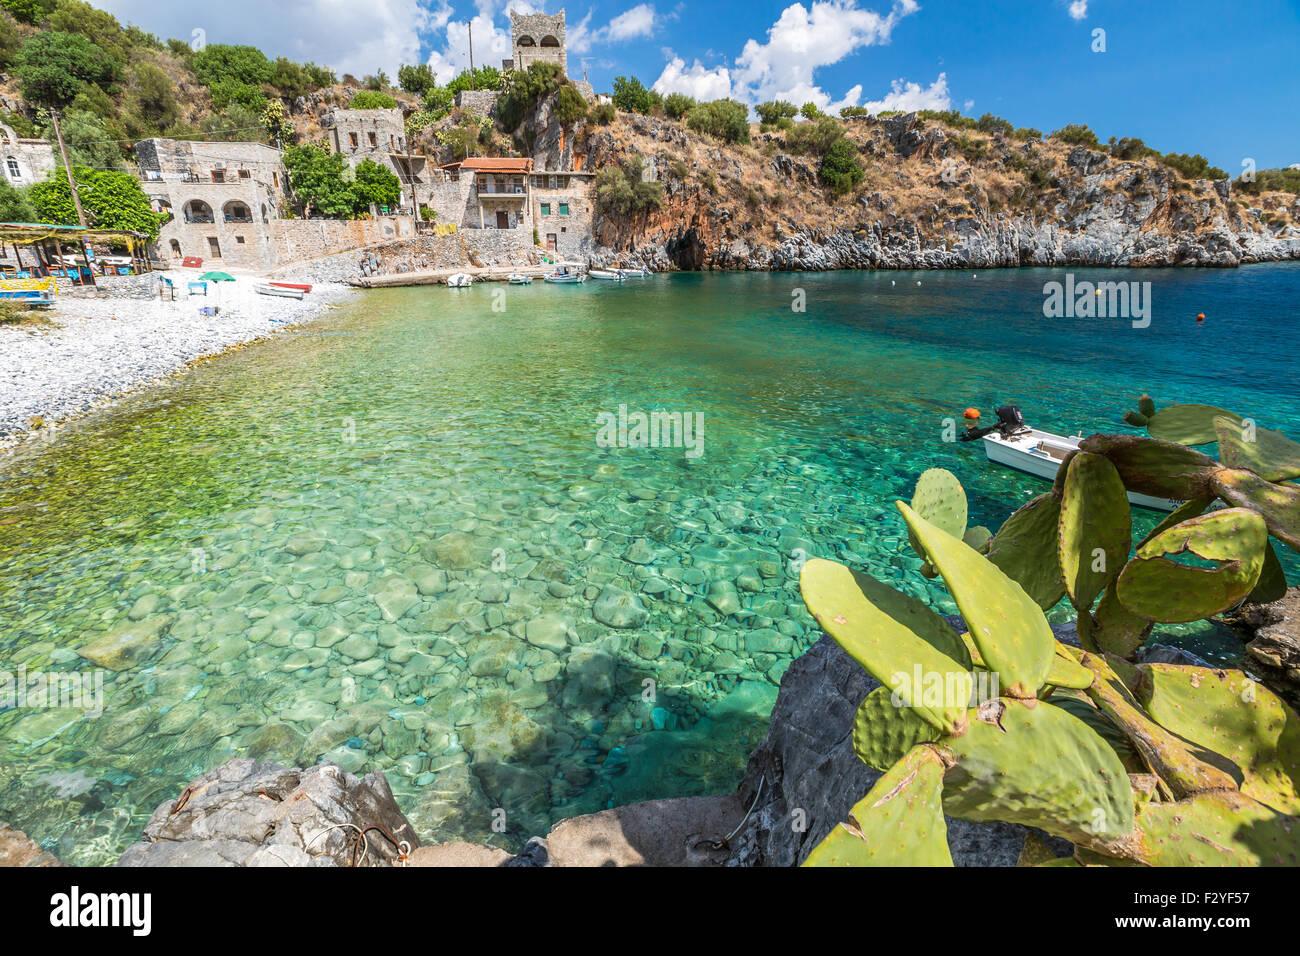 Peloponnese Harbour - Stock Image